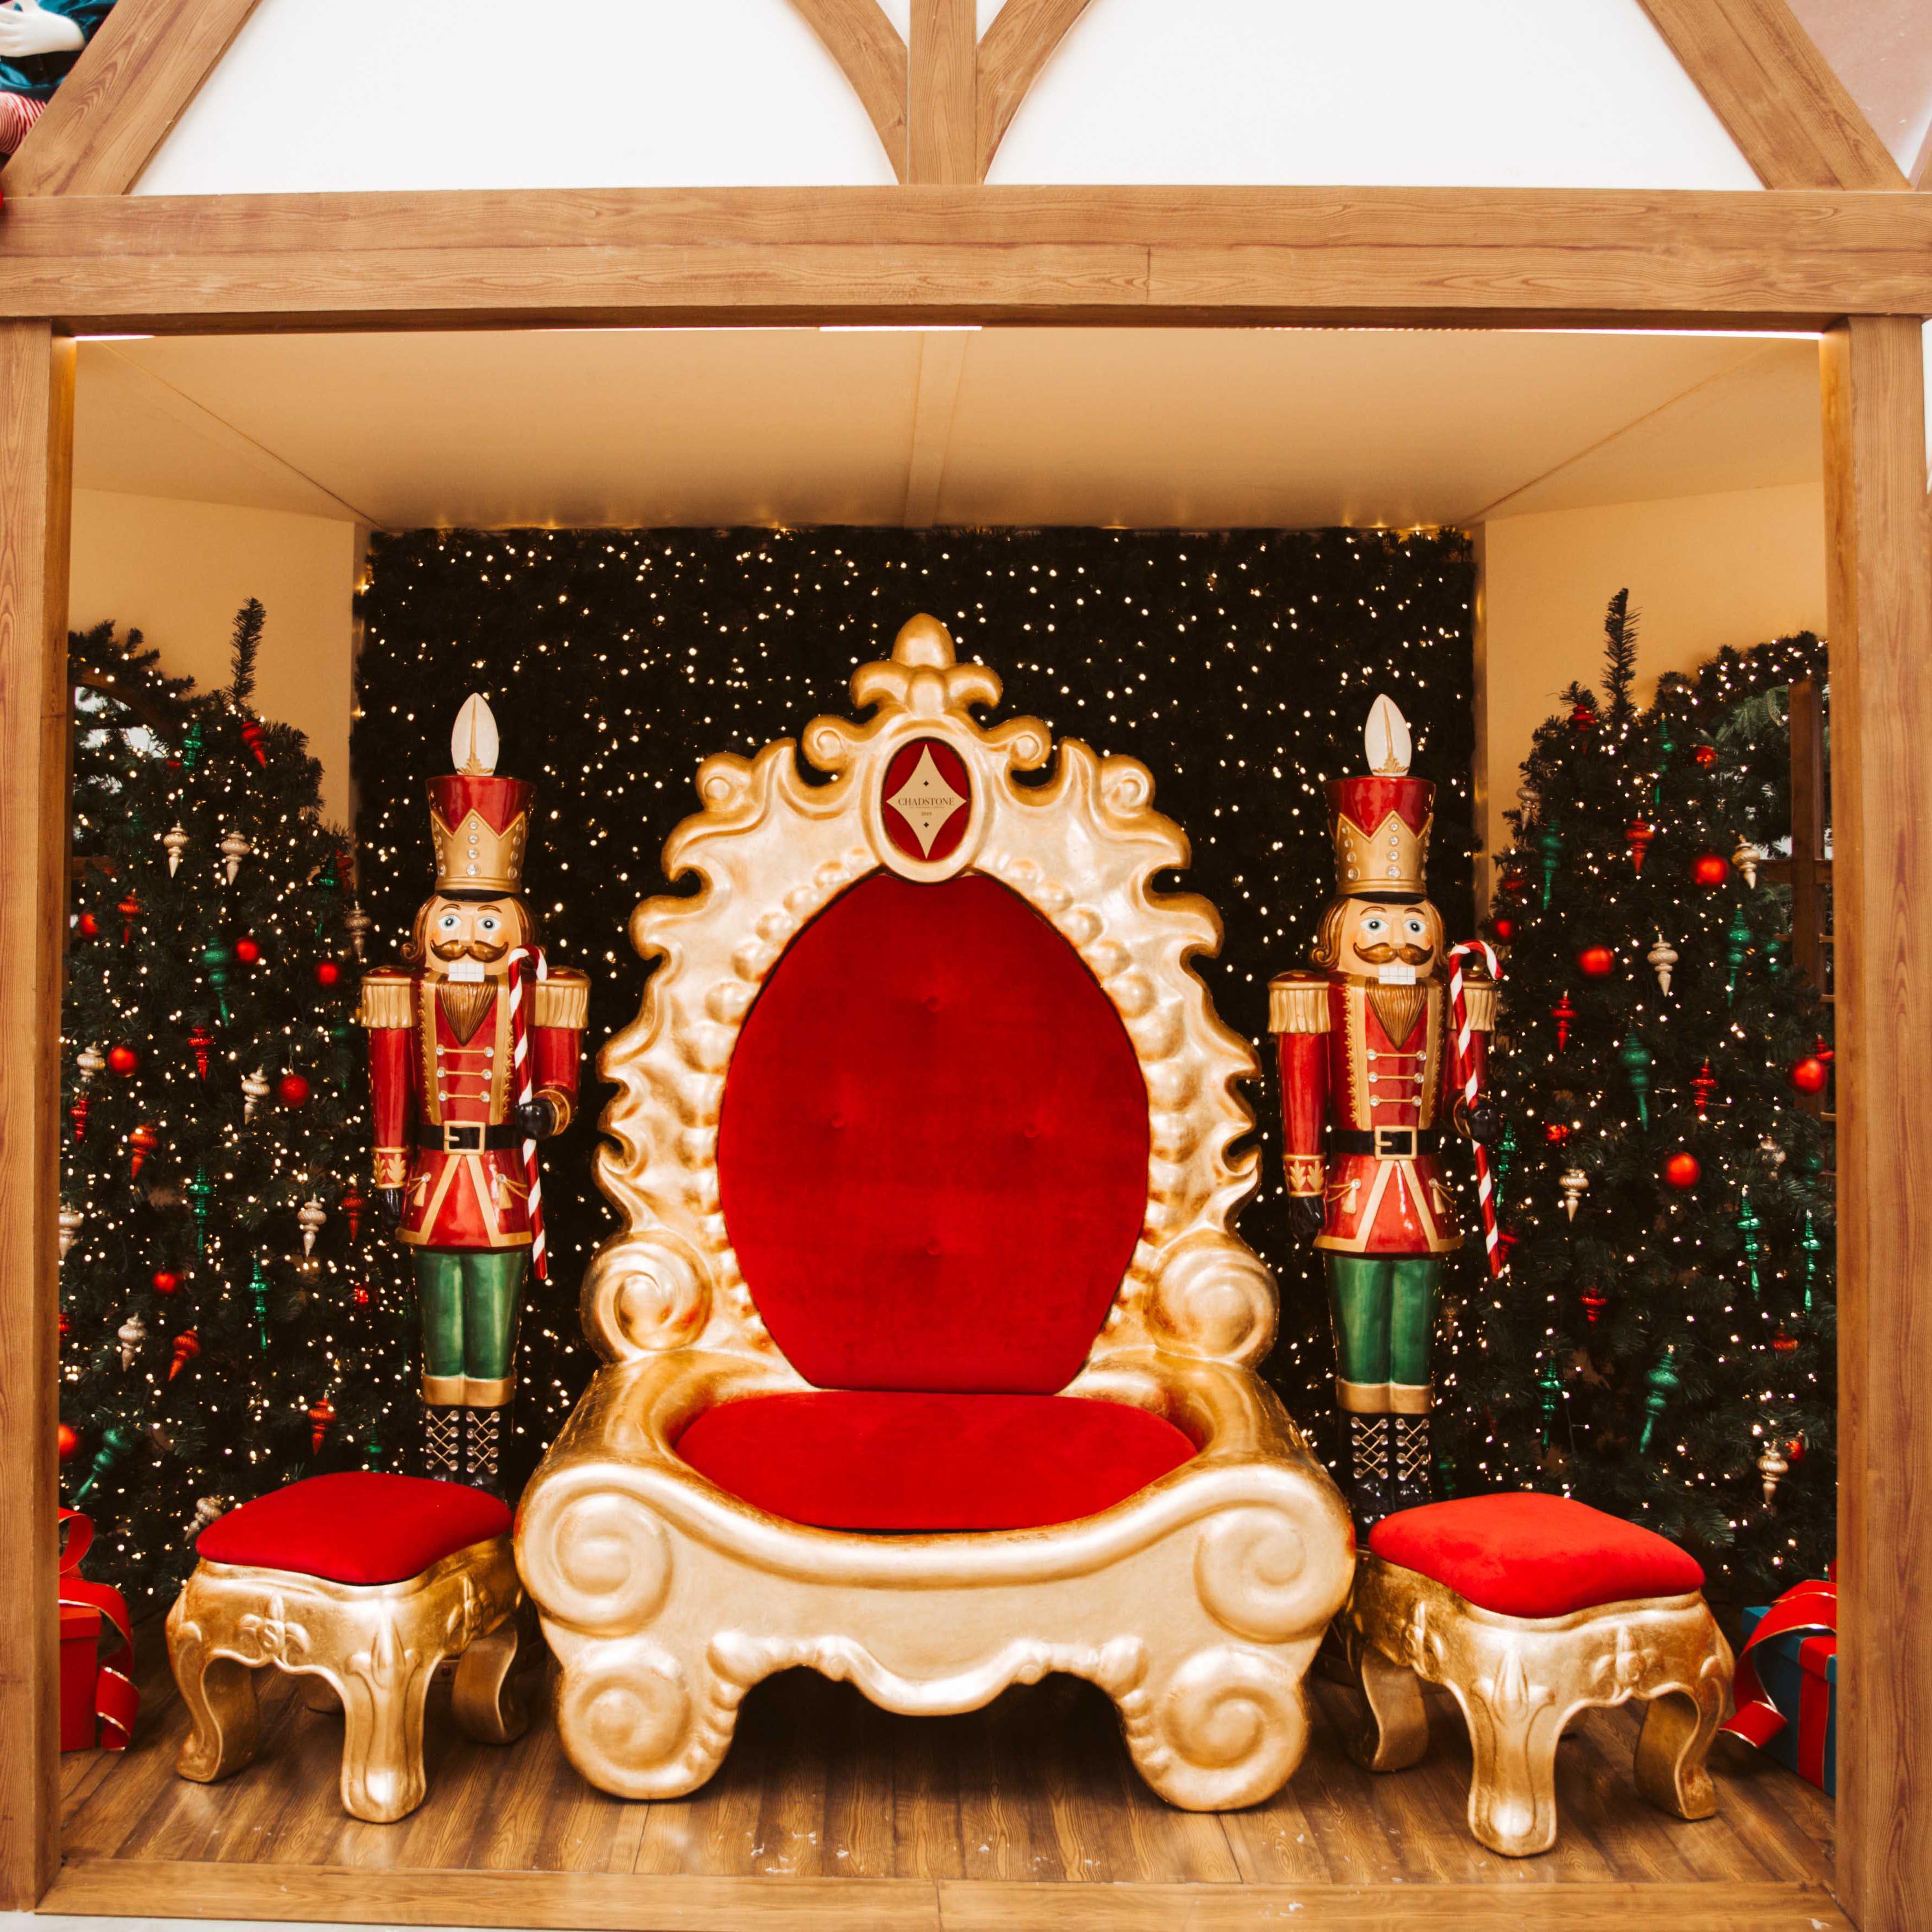 Sensitive Santa - Your Chadstone Santa Experience: Main Image